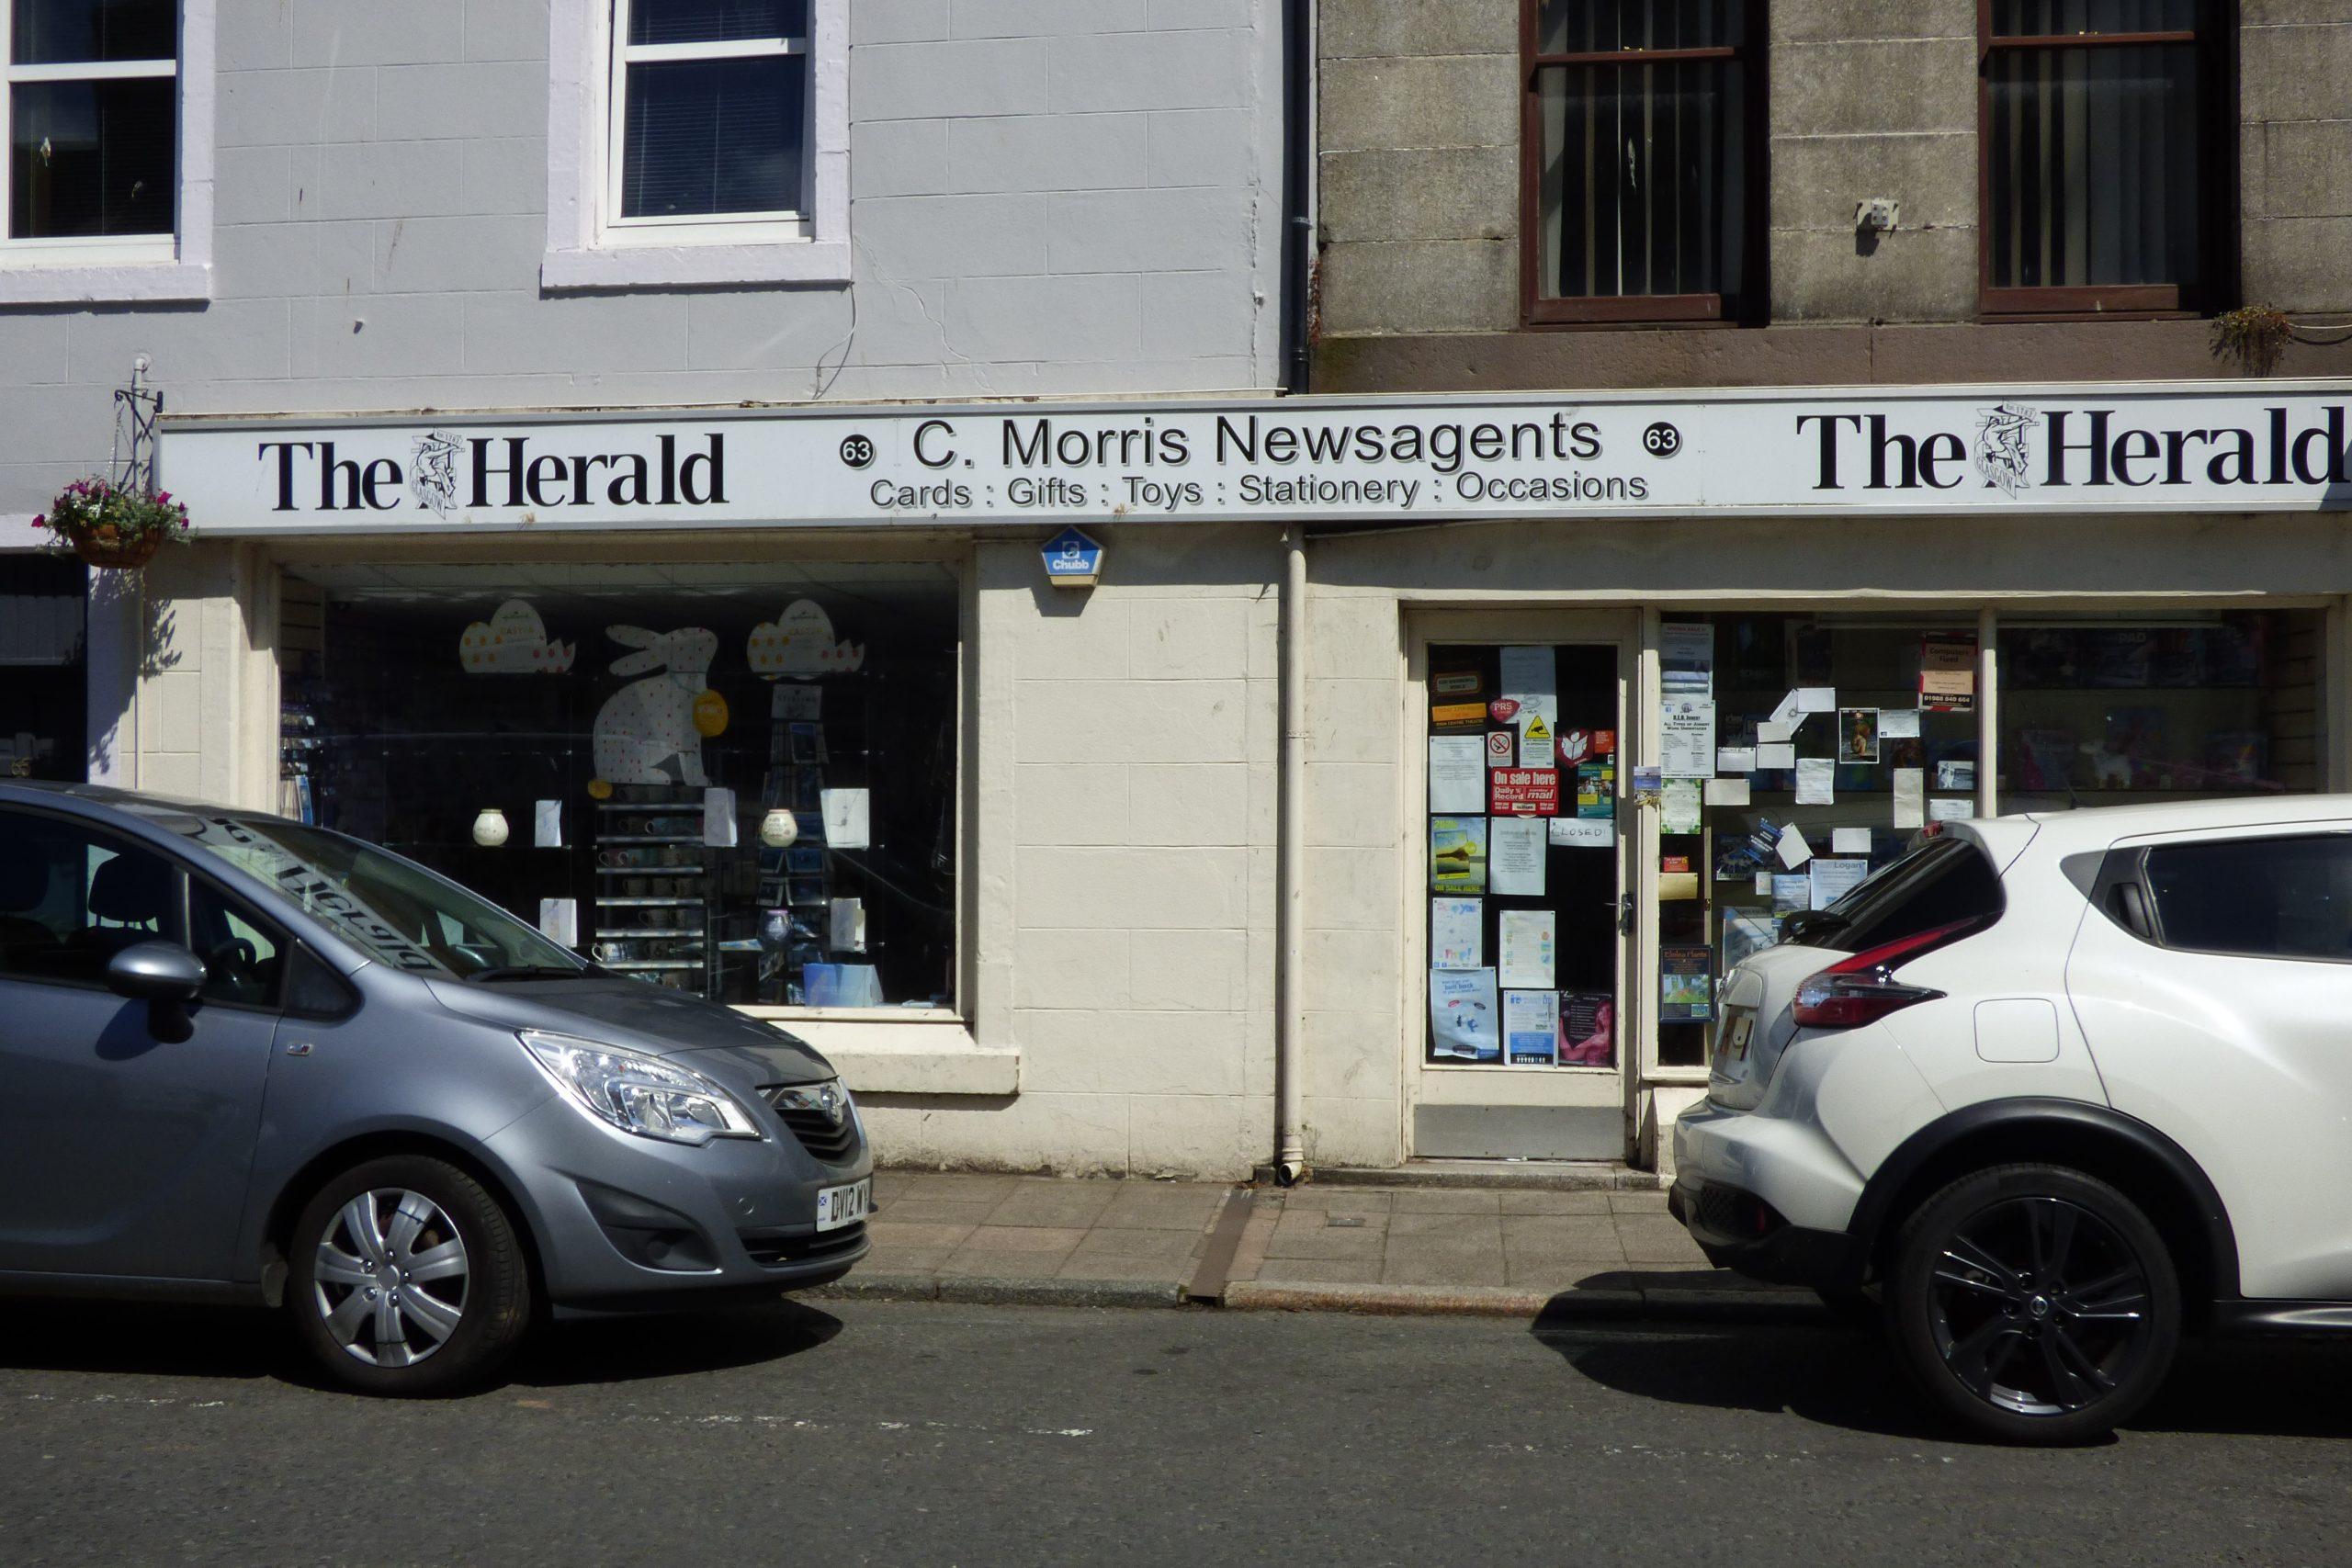 Shop Premises, 63, Victoria Street, Newton Stewart, DG8 6NL